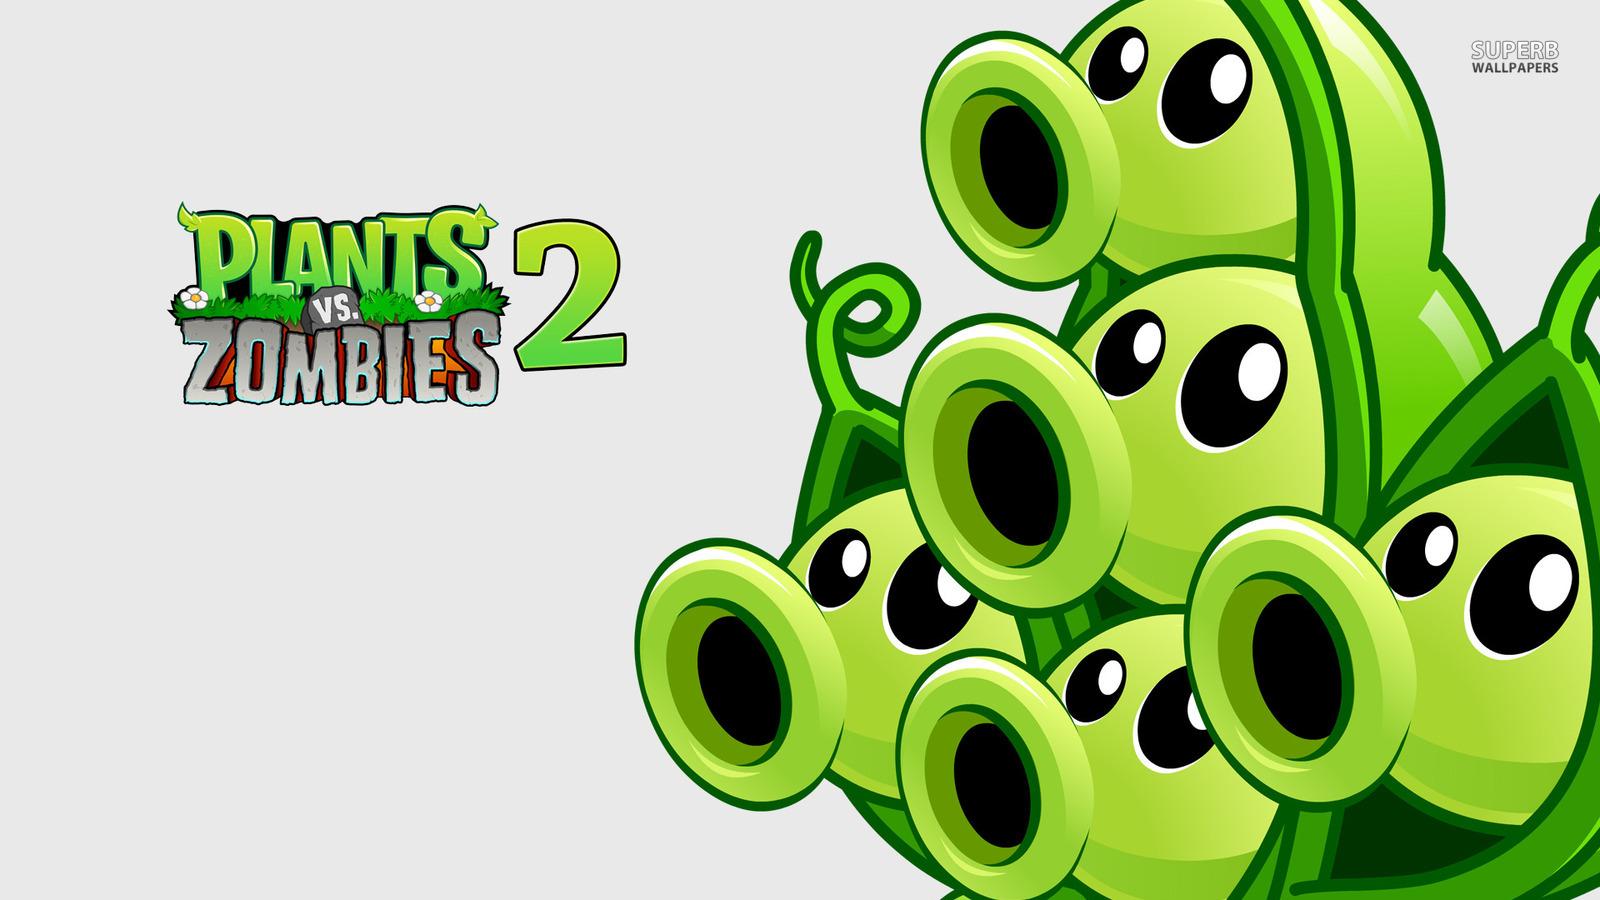 Plants Vs Zombies 2 Video Games Wallpaper 38707868 Fanpop